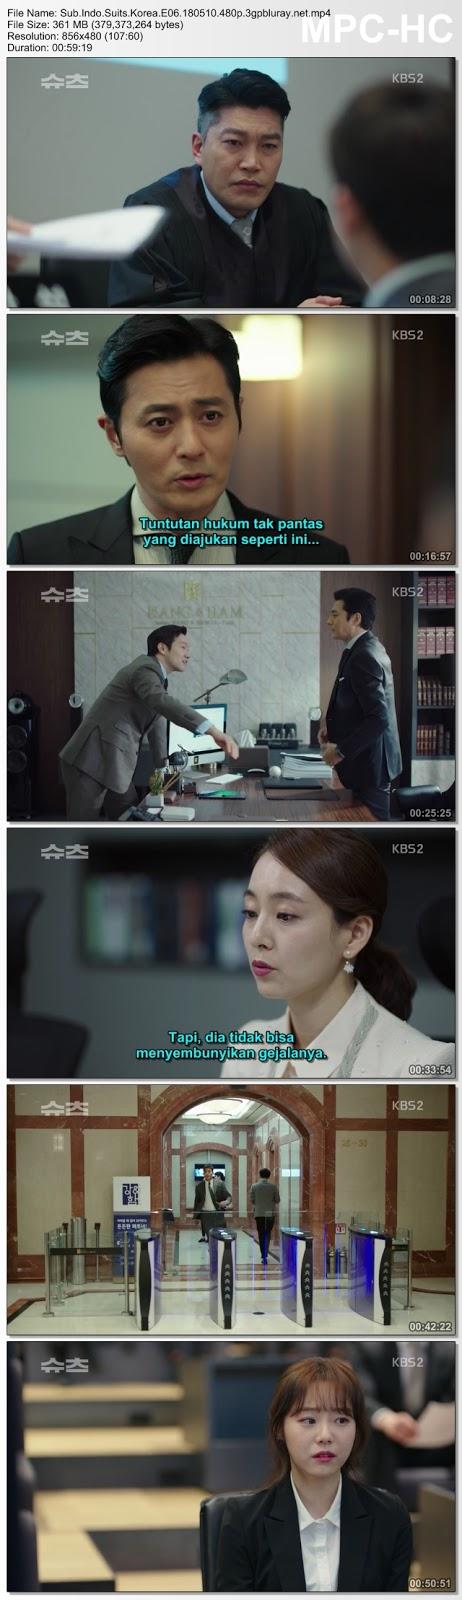 Screenshots Download Drama Korea Suits aka Shucheu aka 슈츠 (2018) Episode 06 HDTV 1080p 720p 480p 3GP MP4 NEXT Subtitle Indonesia Google Drive Free Full Movie Online